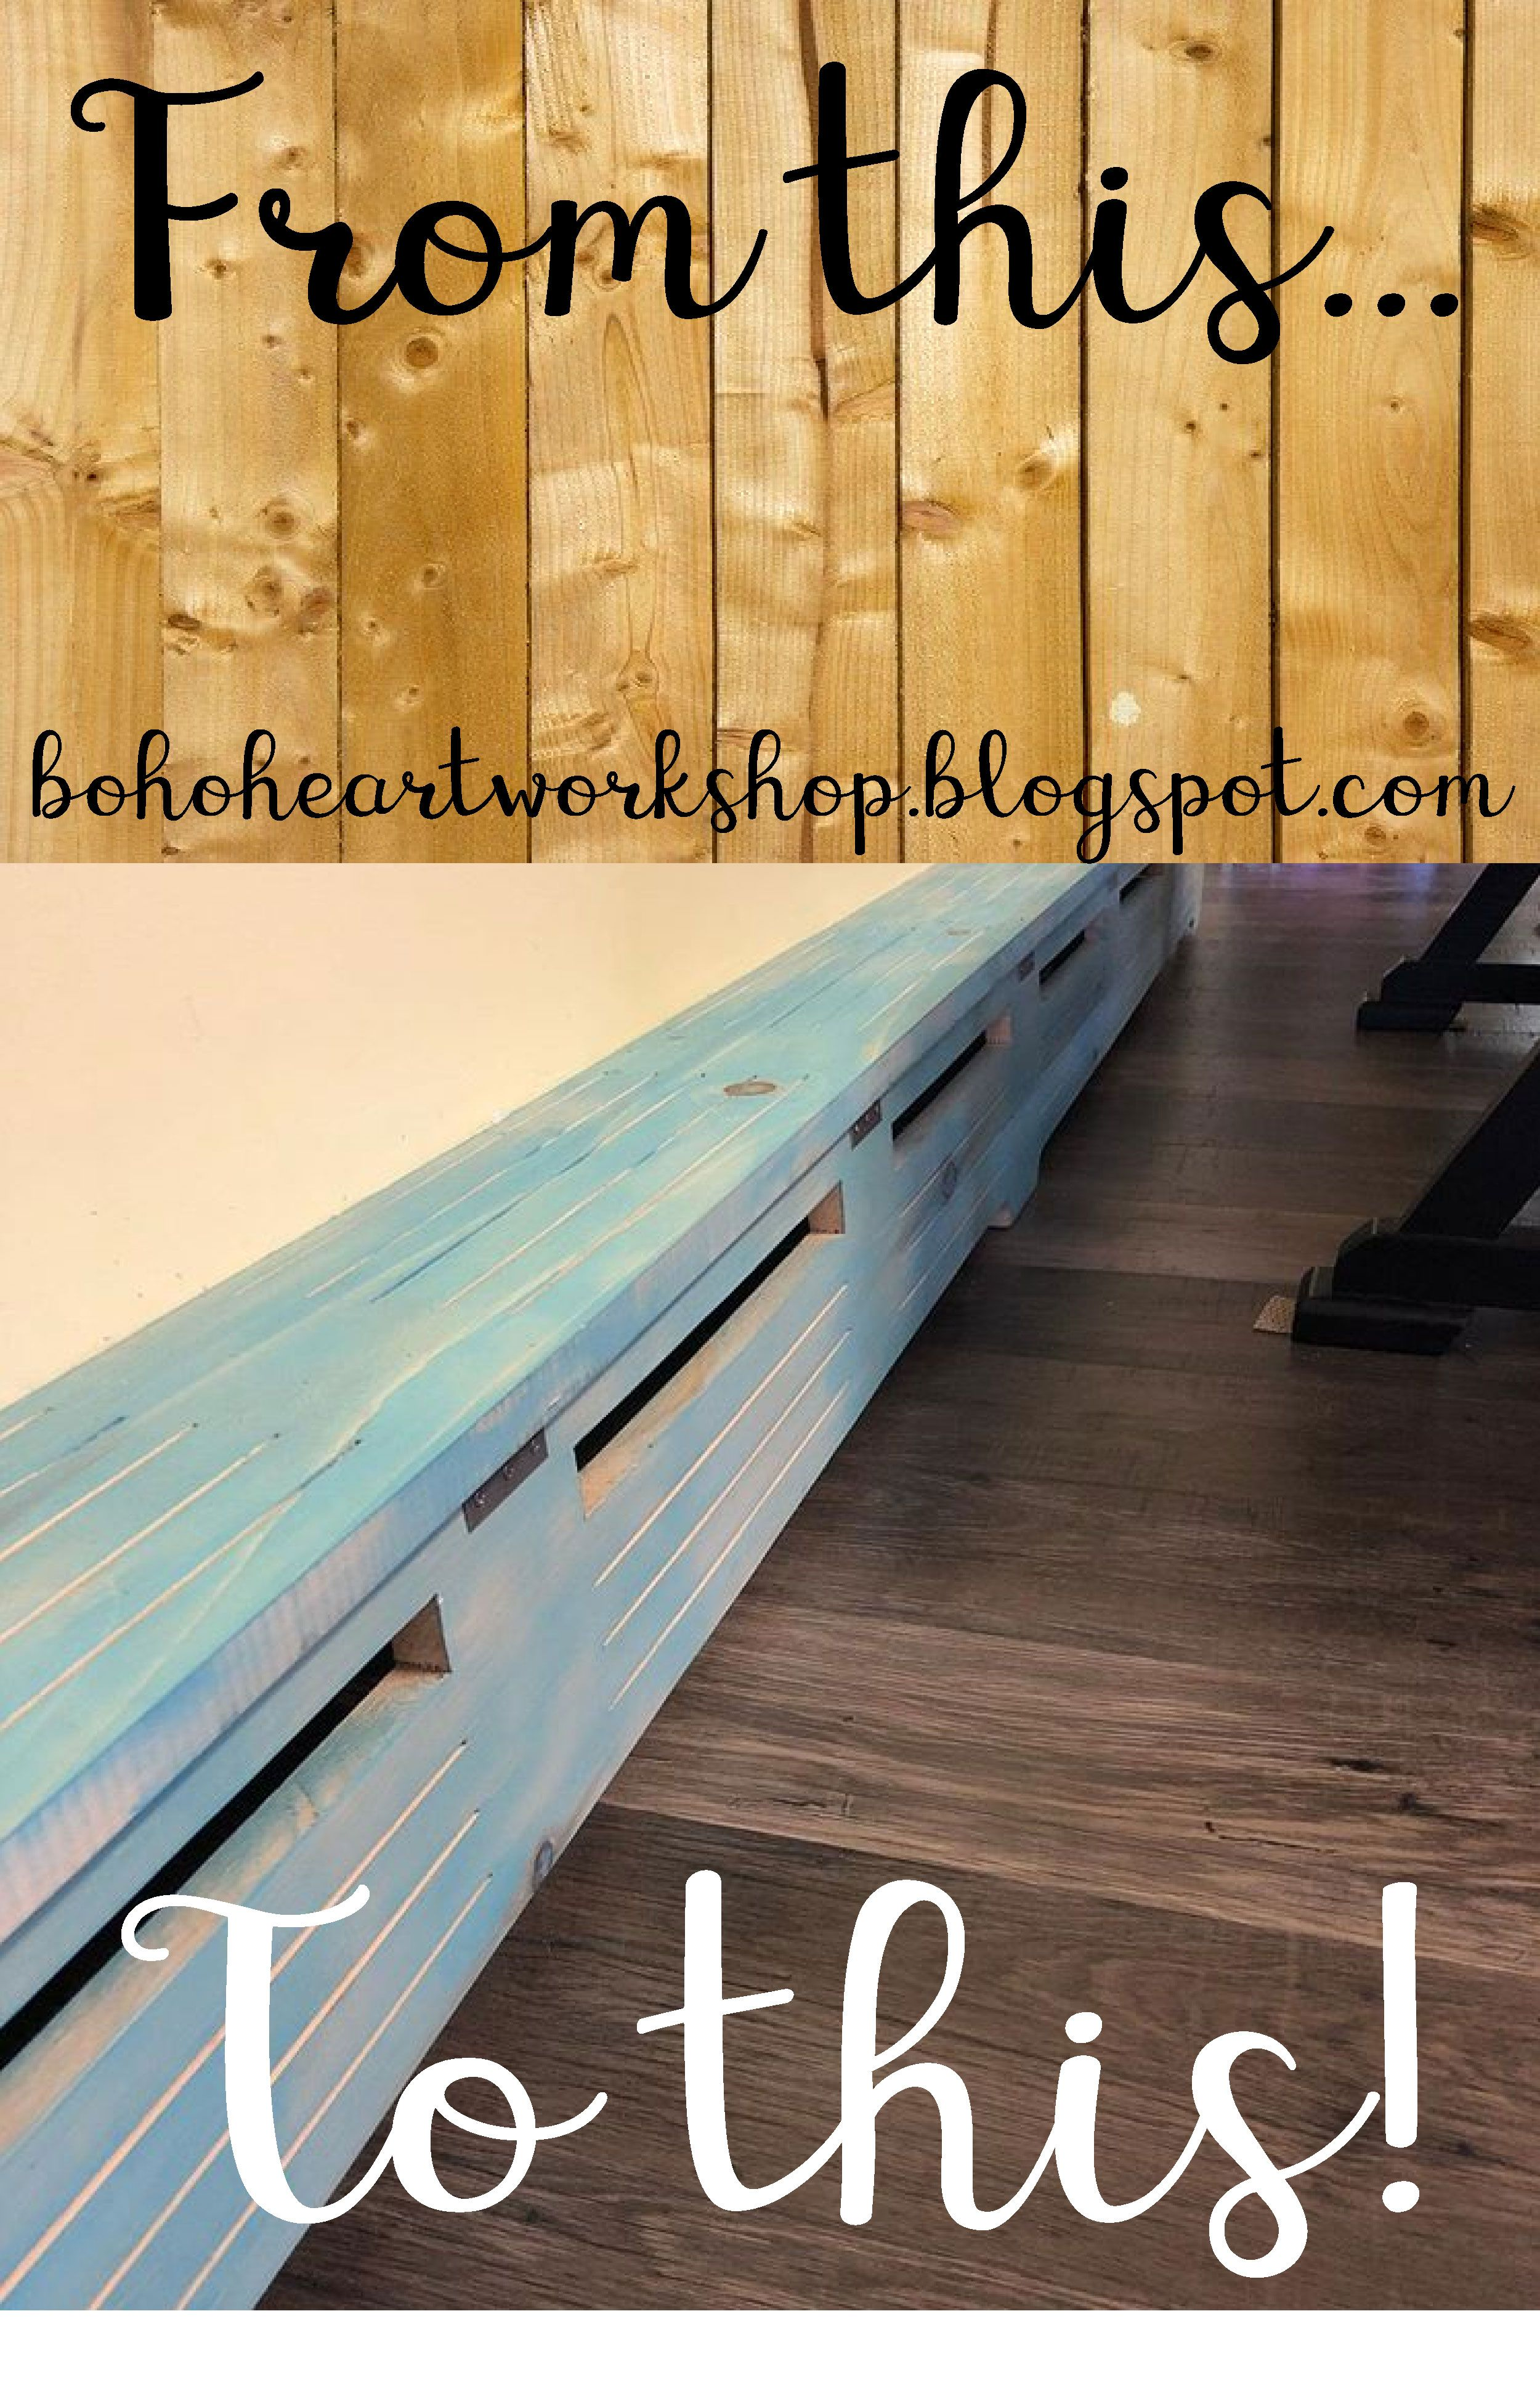 Diy wooden baseboard cover in 2020 wooden diy